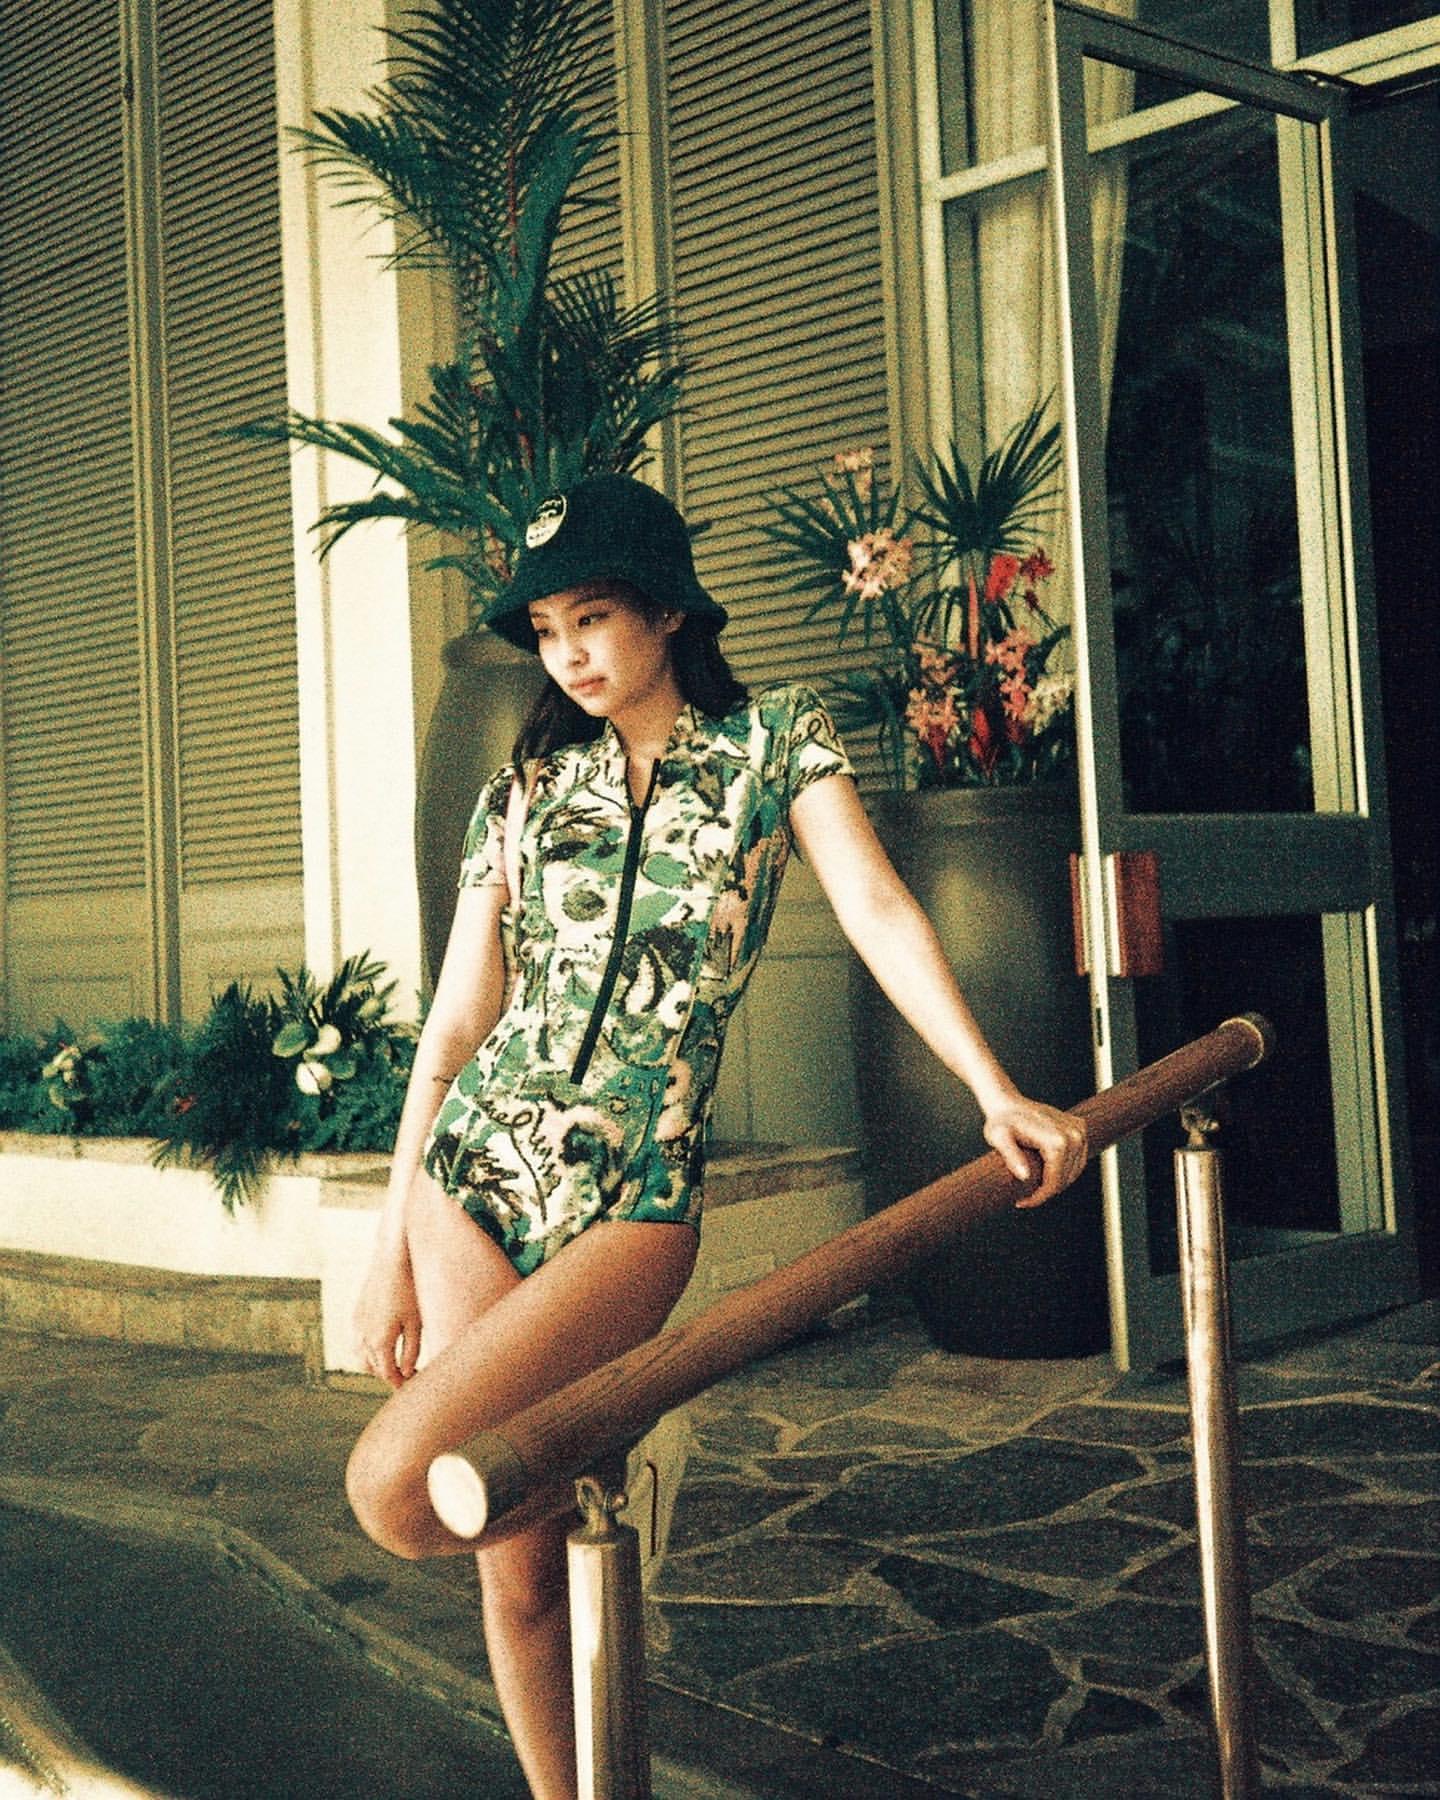 BLACKPINK Jennie's Swimsuit Look Was So Stunning Even Elle Korea Couldn't Help Falling In Love